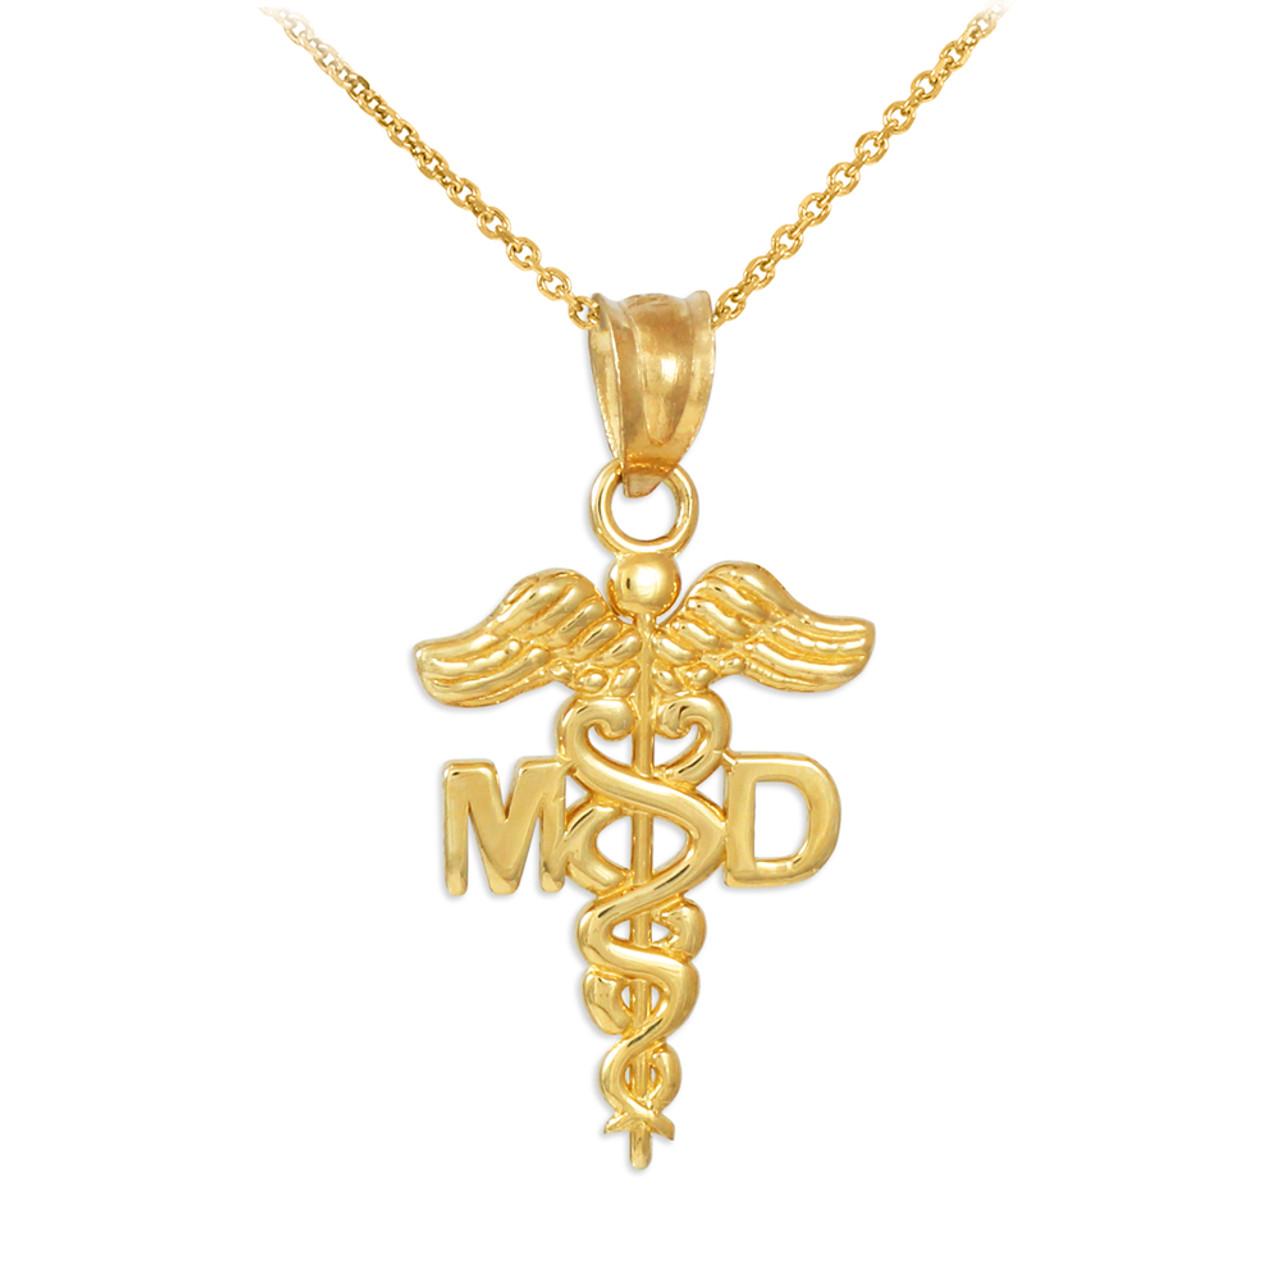 Gold Medical Doctor Md Caduceus Charm Pendant